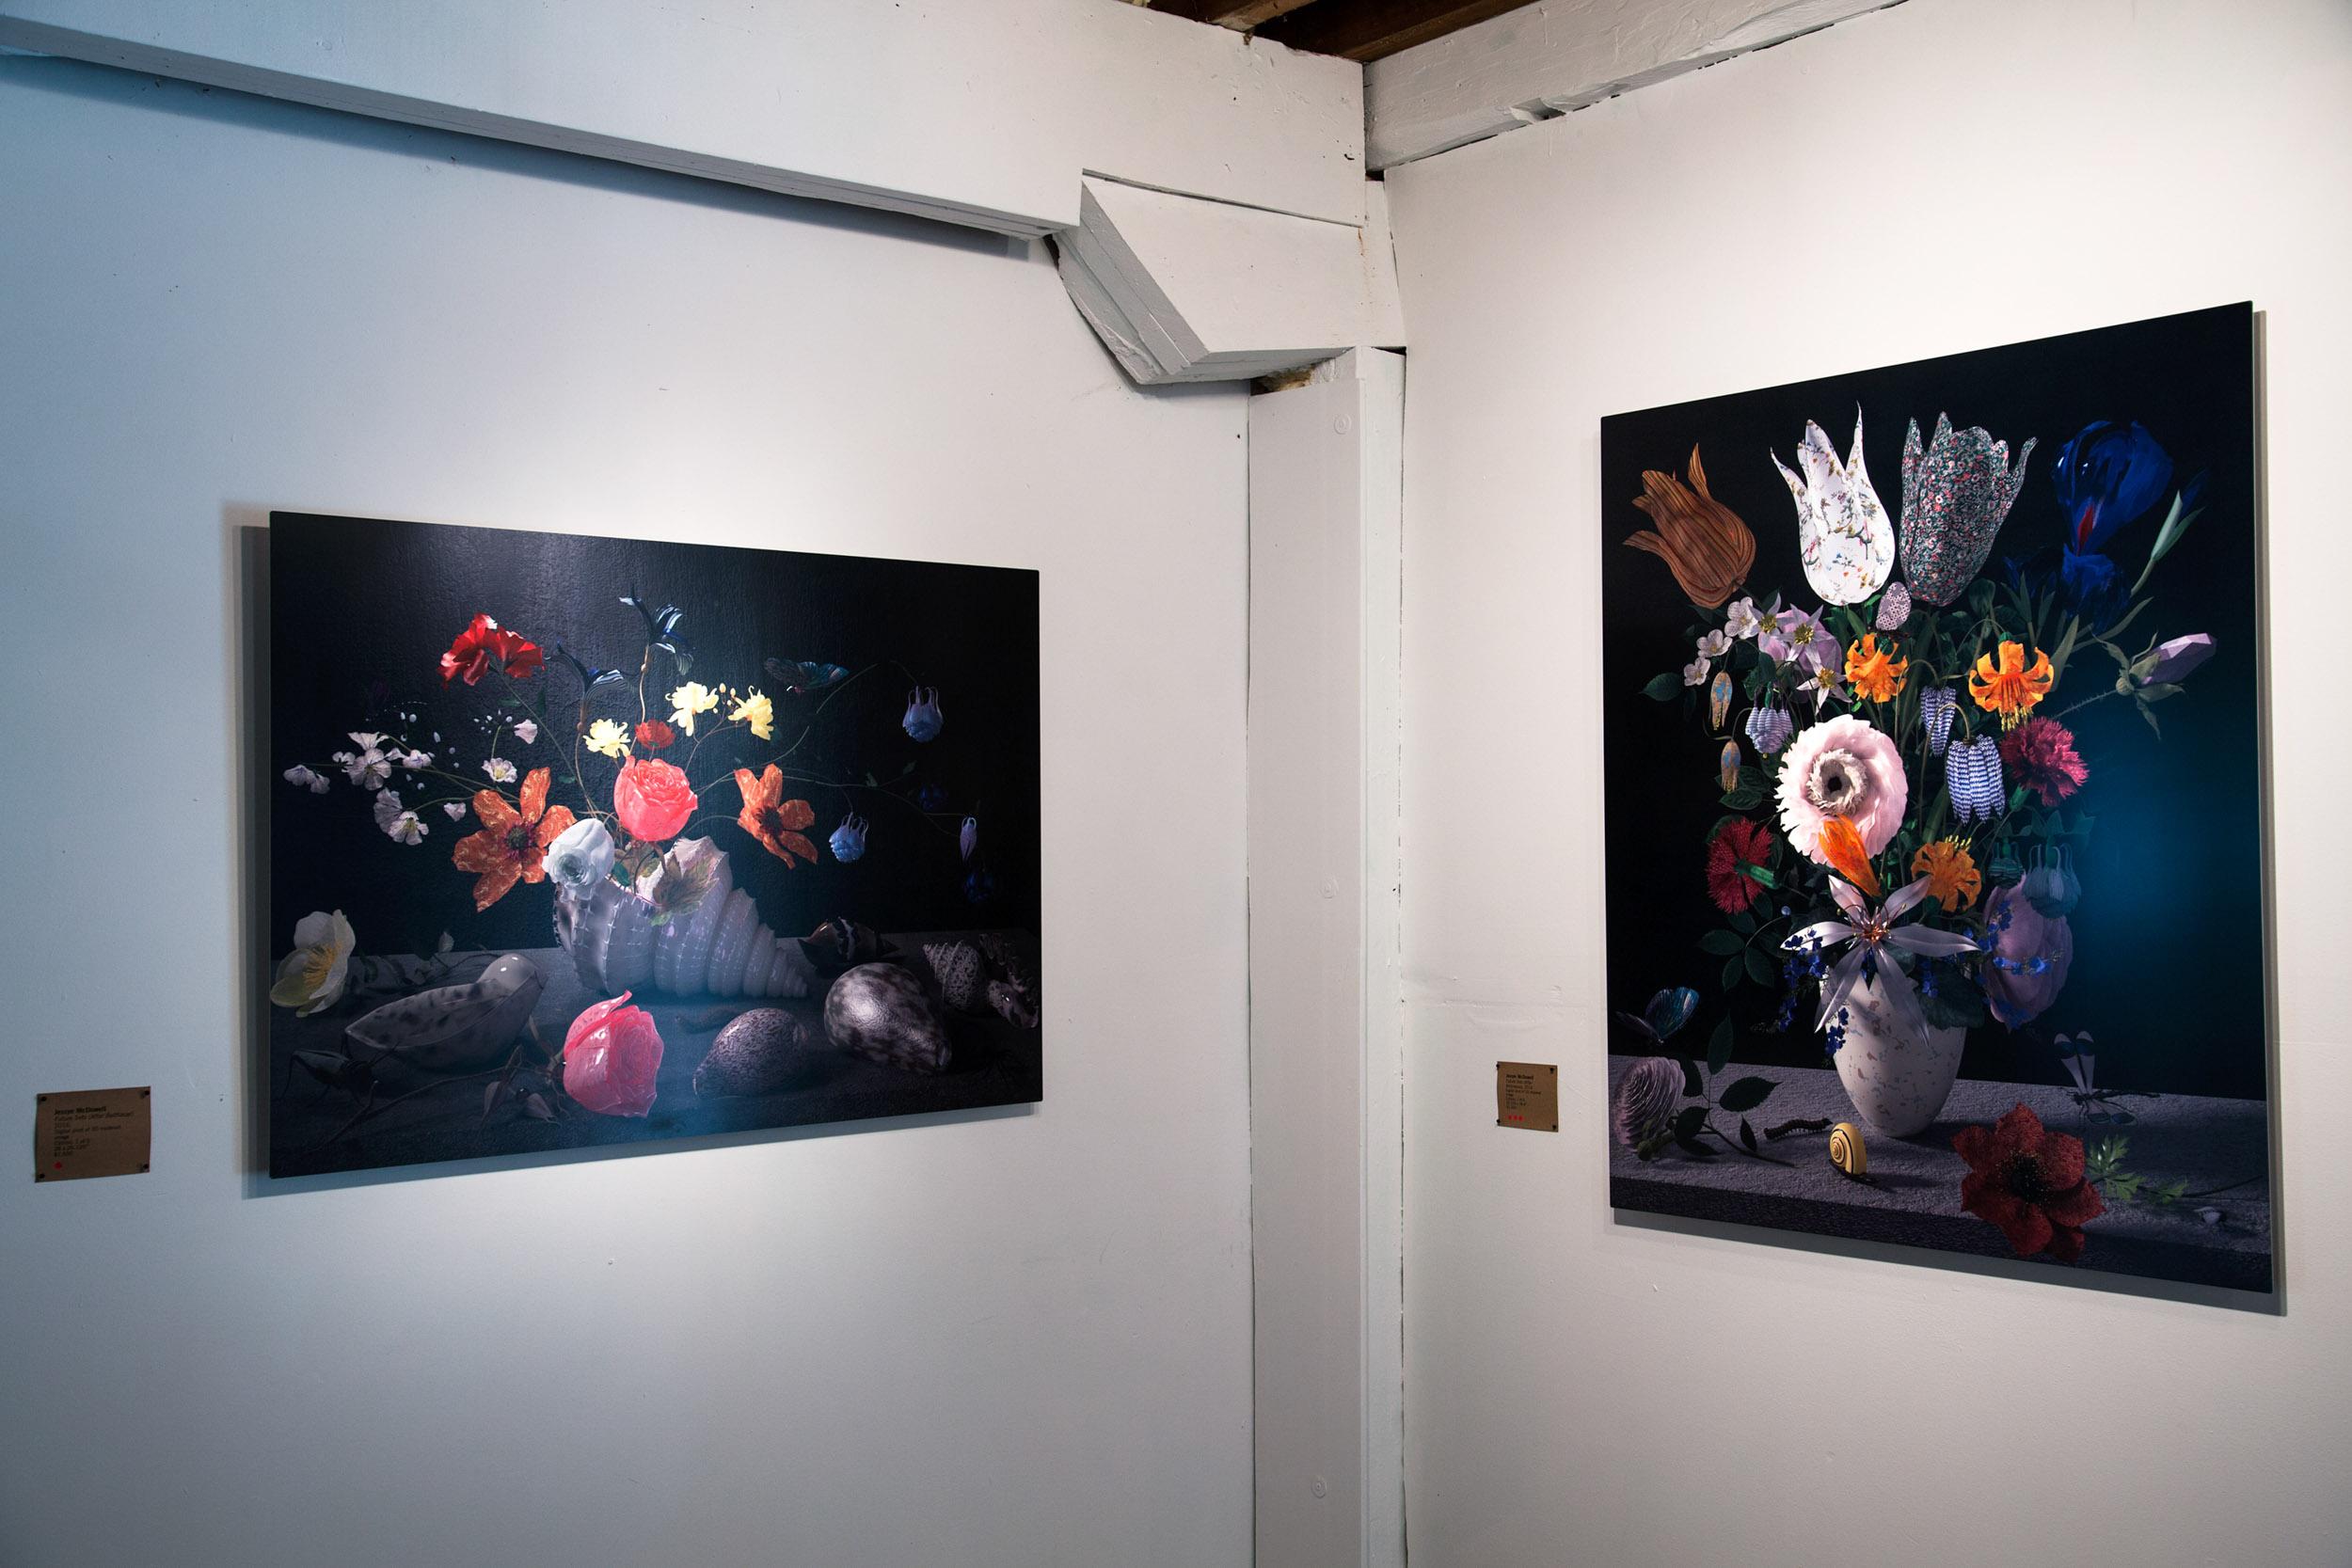 JESSYE MCDOWELL - Exhibition Artist